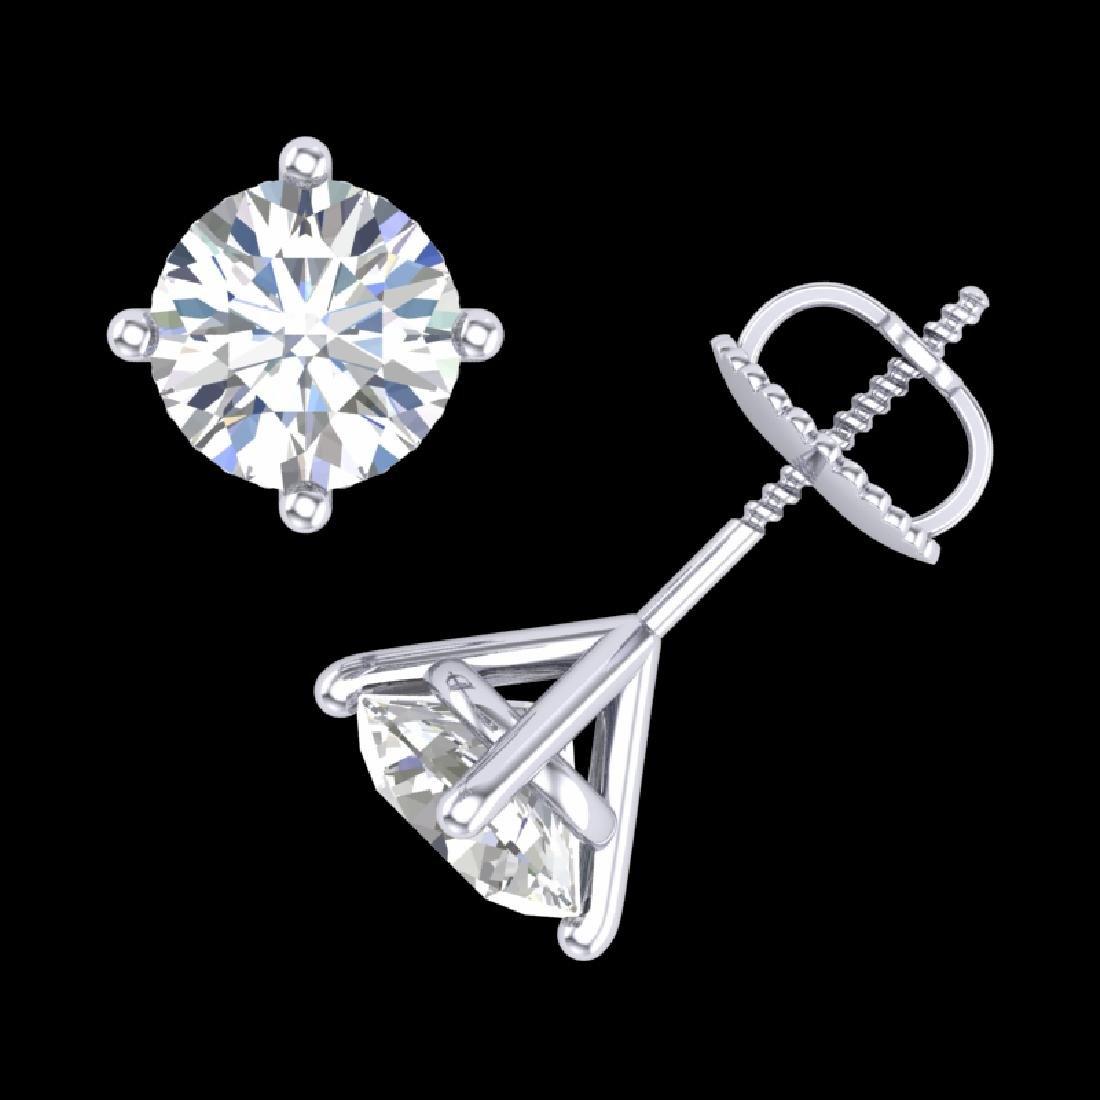 2 CTW VS/SI Diamond Solitaire Art Deco Stud Earrings - 3